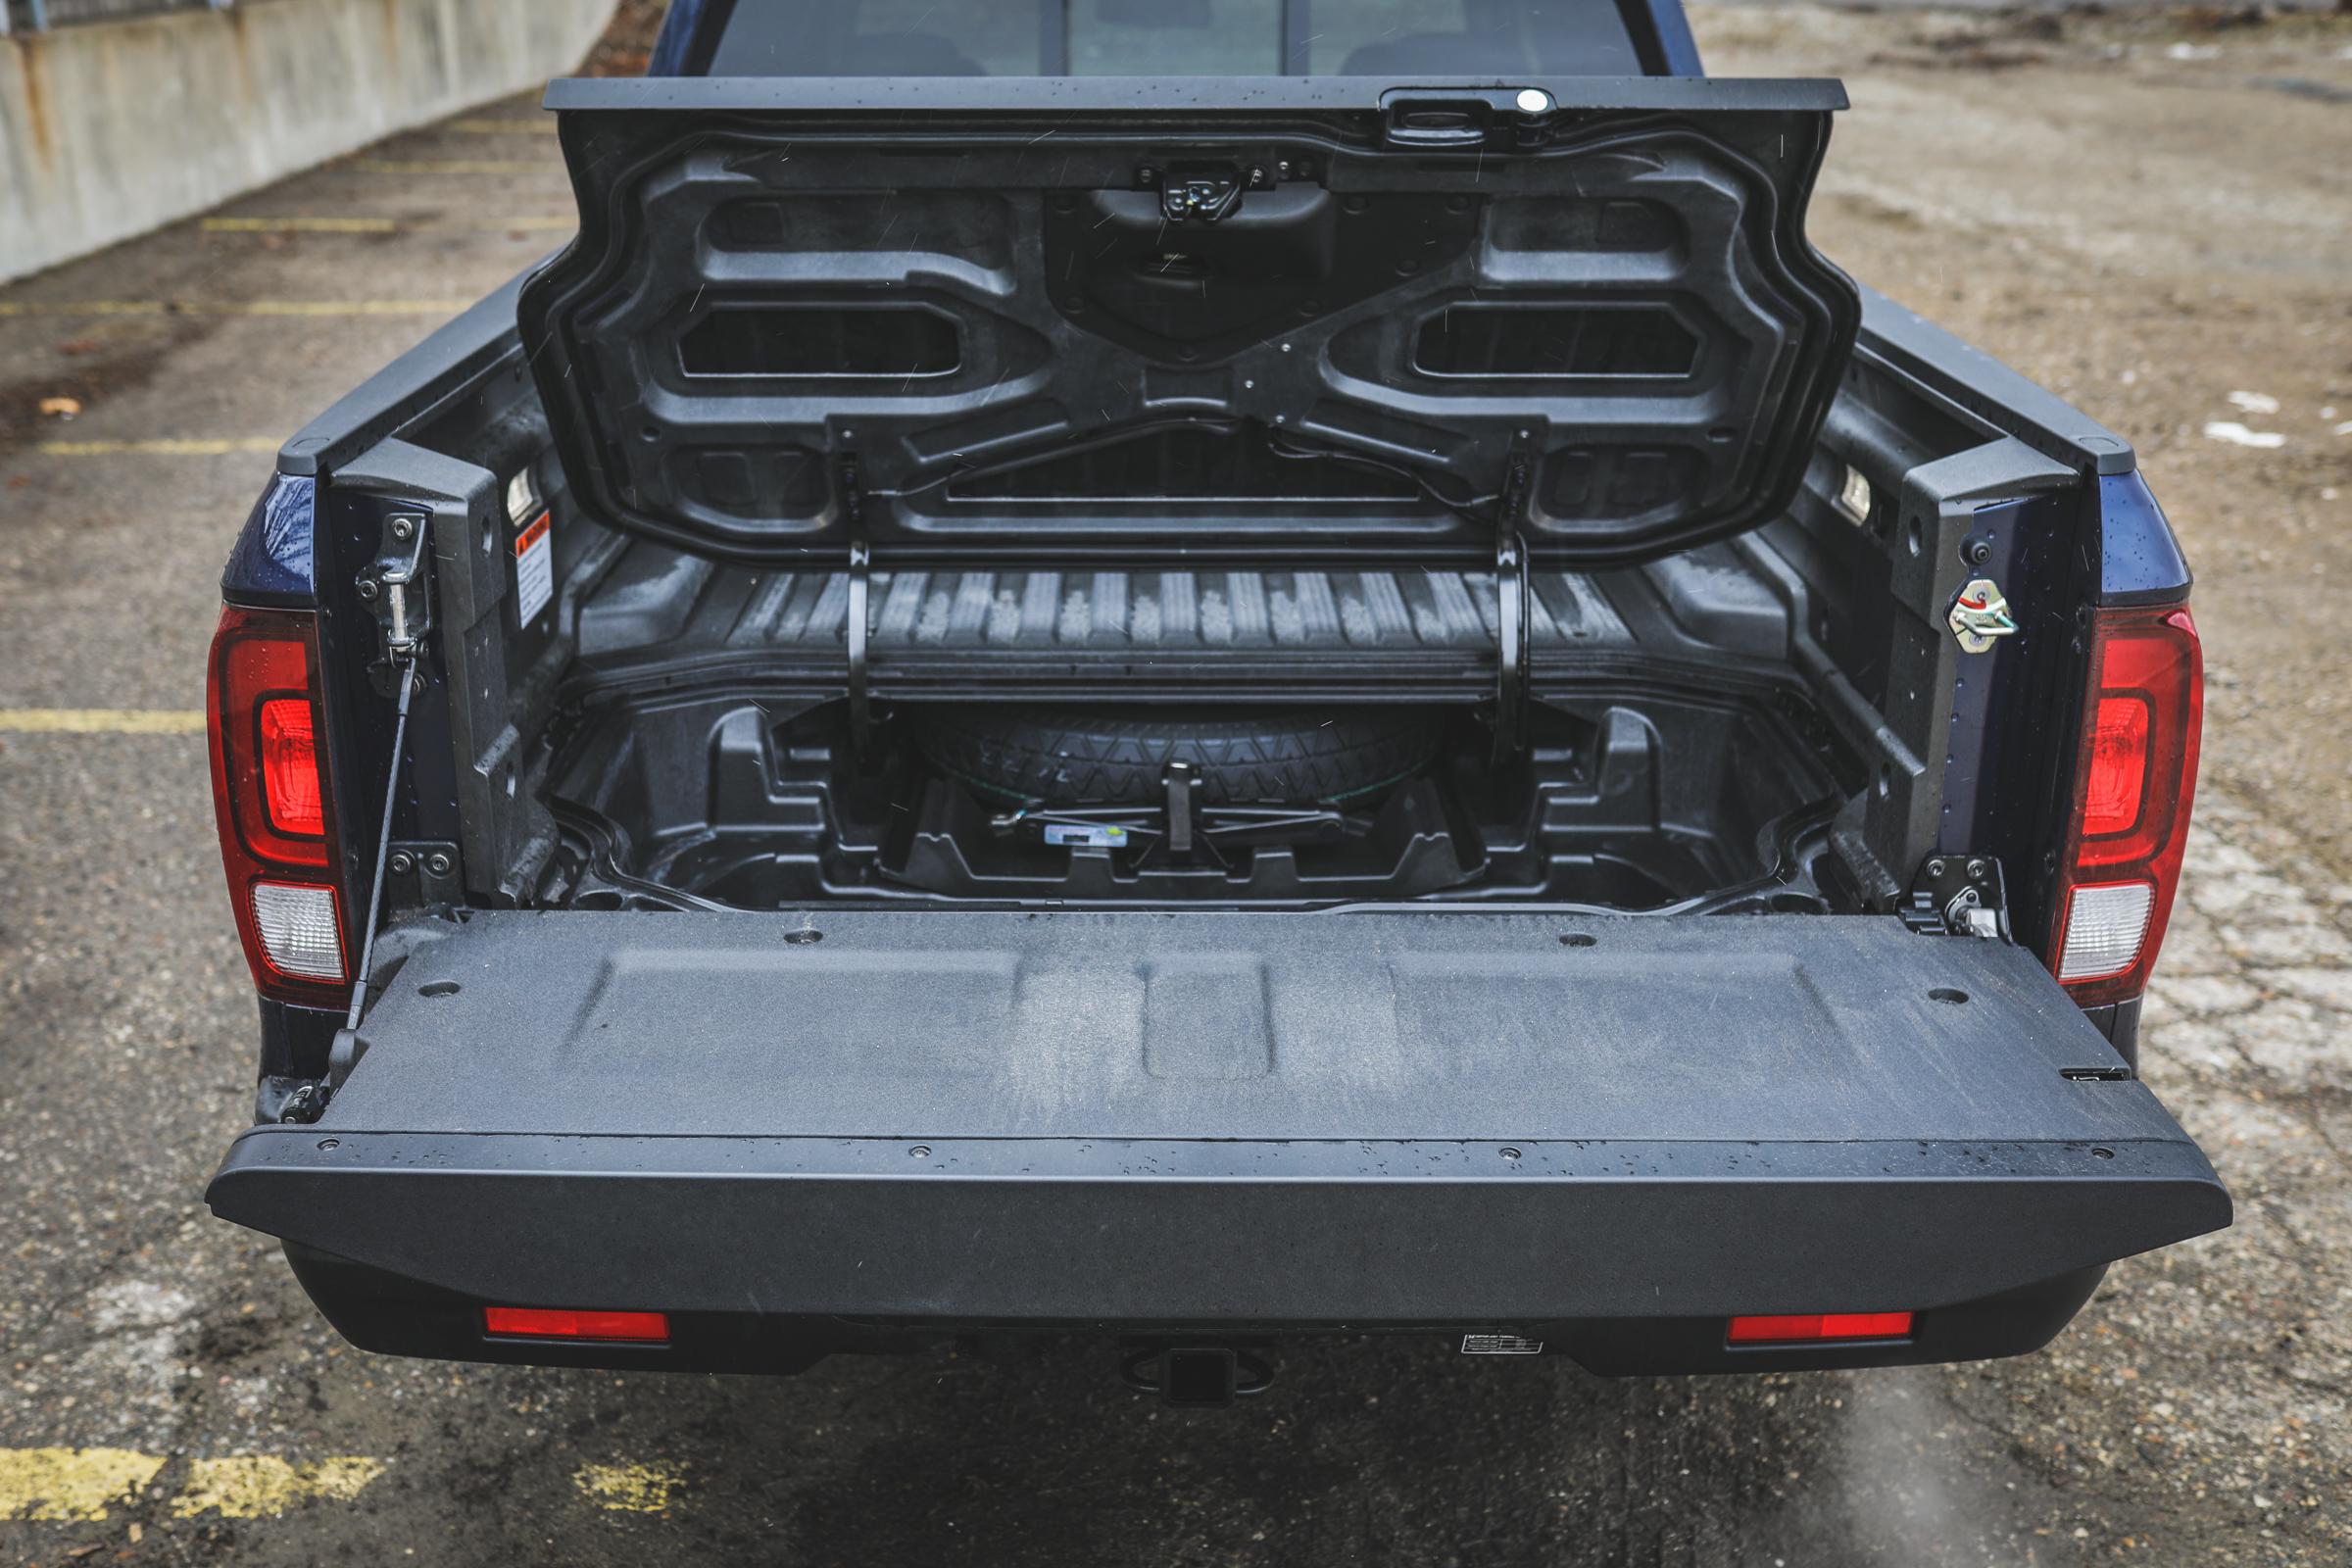 2020 Honda Ridgeline RTL-E tailgate open hidden compartment